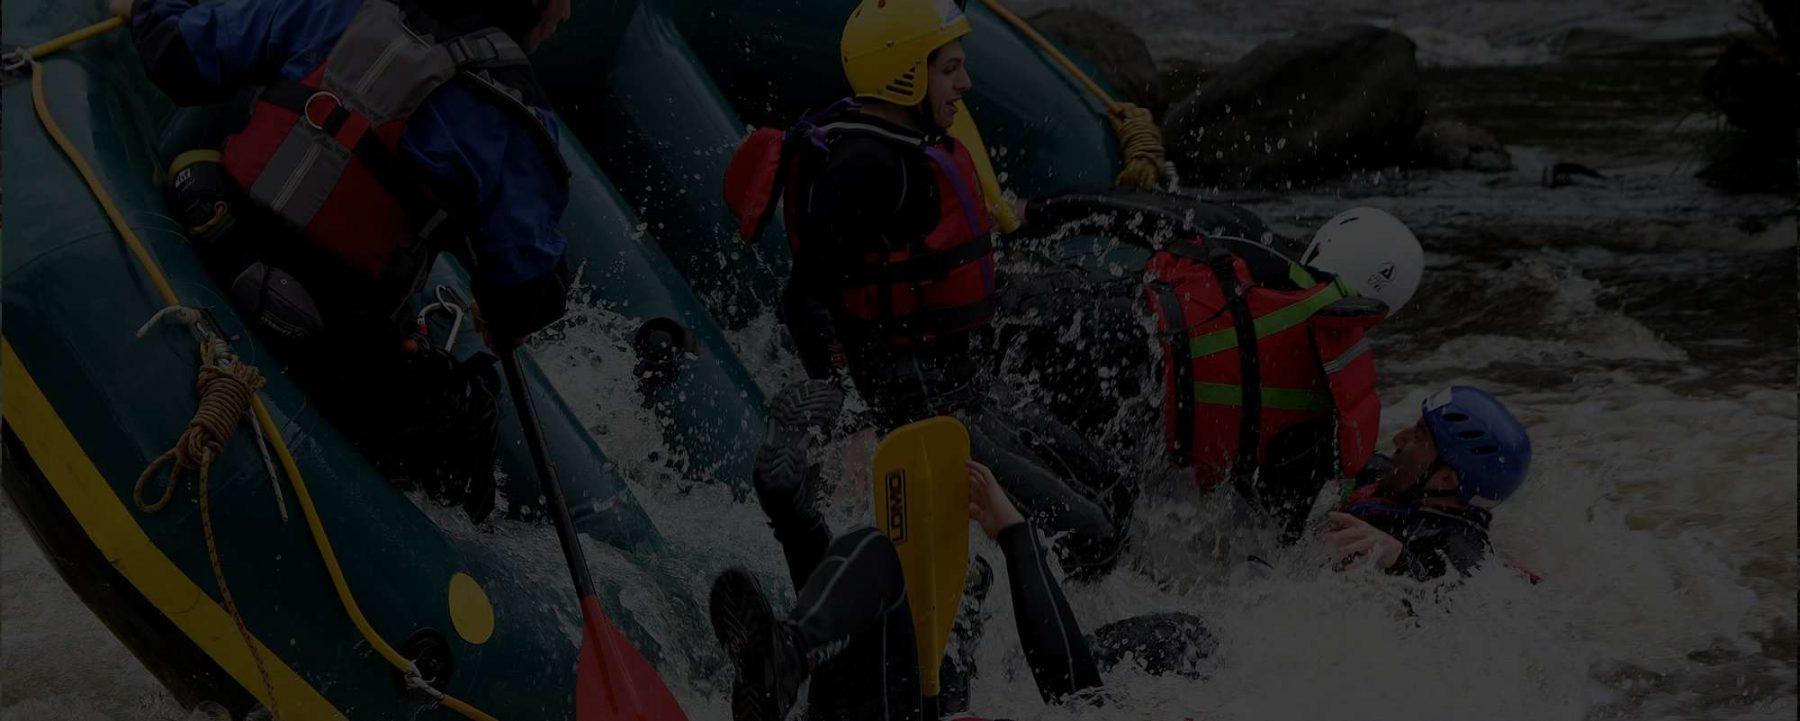 Raft dumping customers in Llangollen